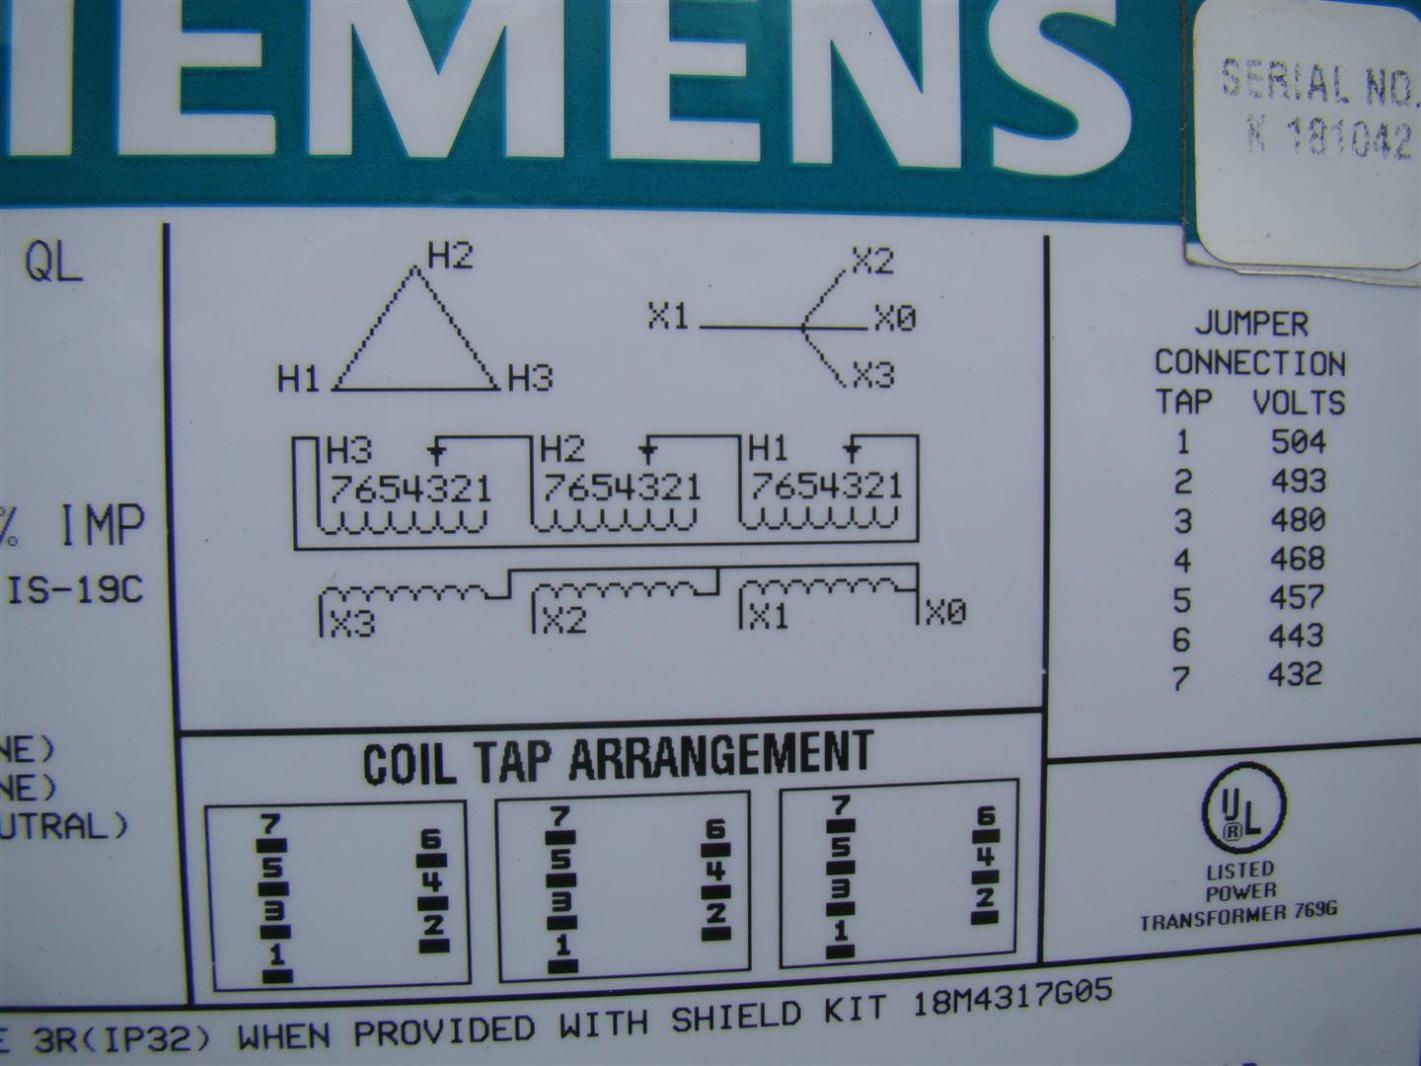 Wiring Diagram Also 480 To 240 Volt 3 Phase Transformer Wiring Diagram